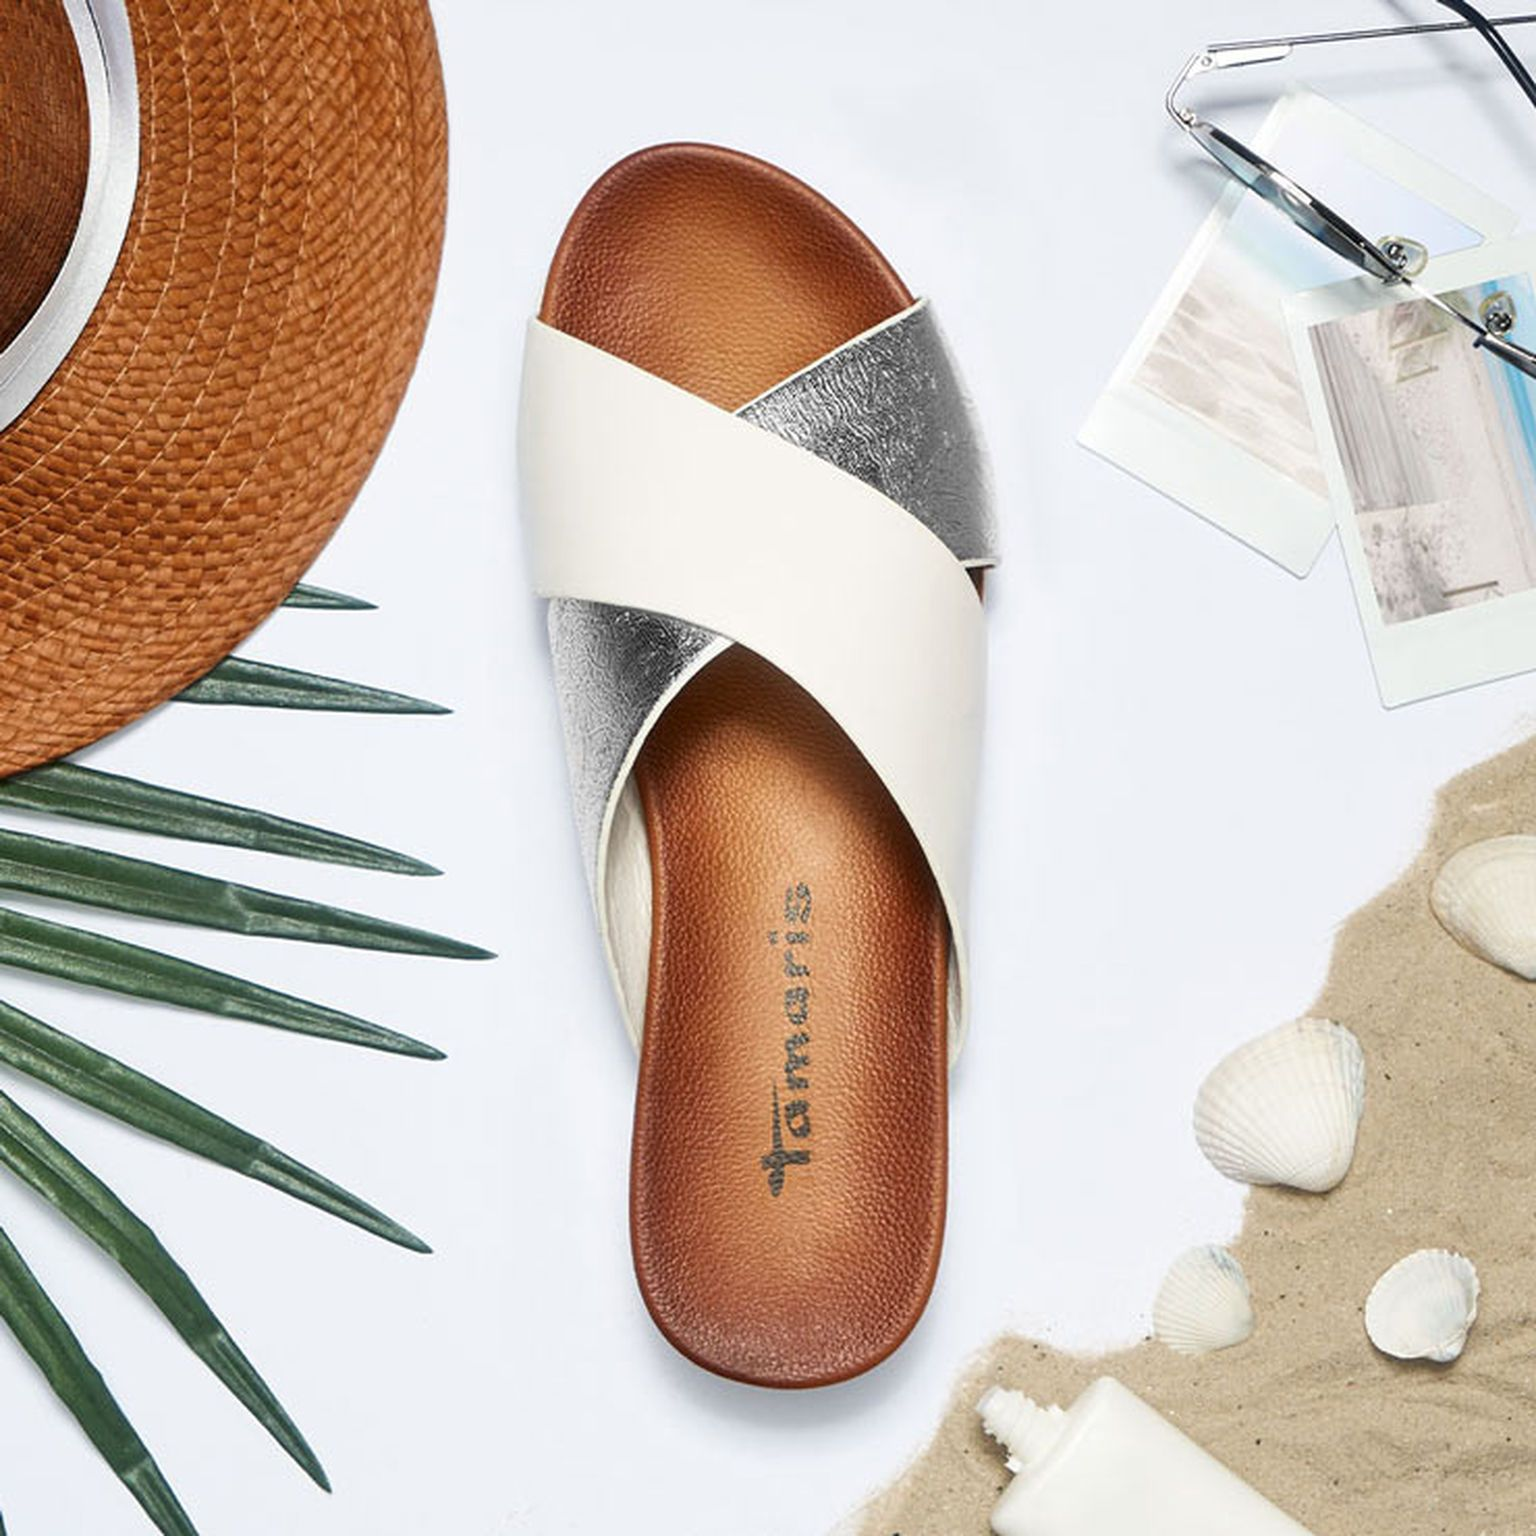 Tamaris online shop – Women s shoes – Women s handbags – Jewellery ... 28dae523af4